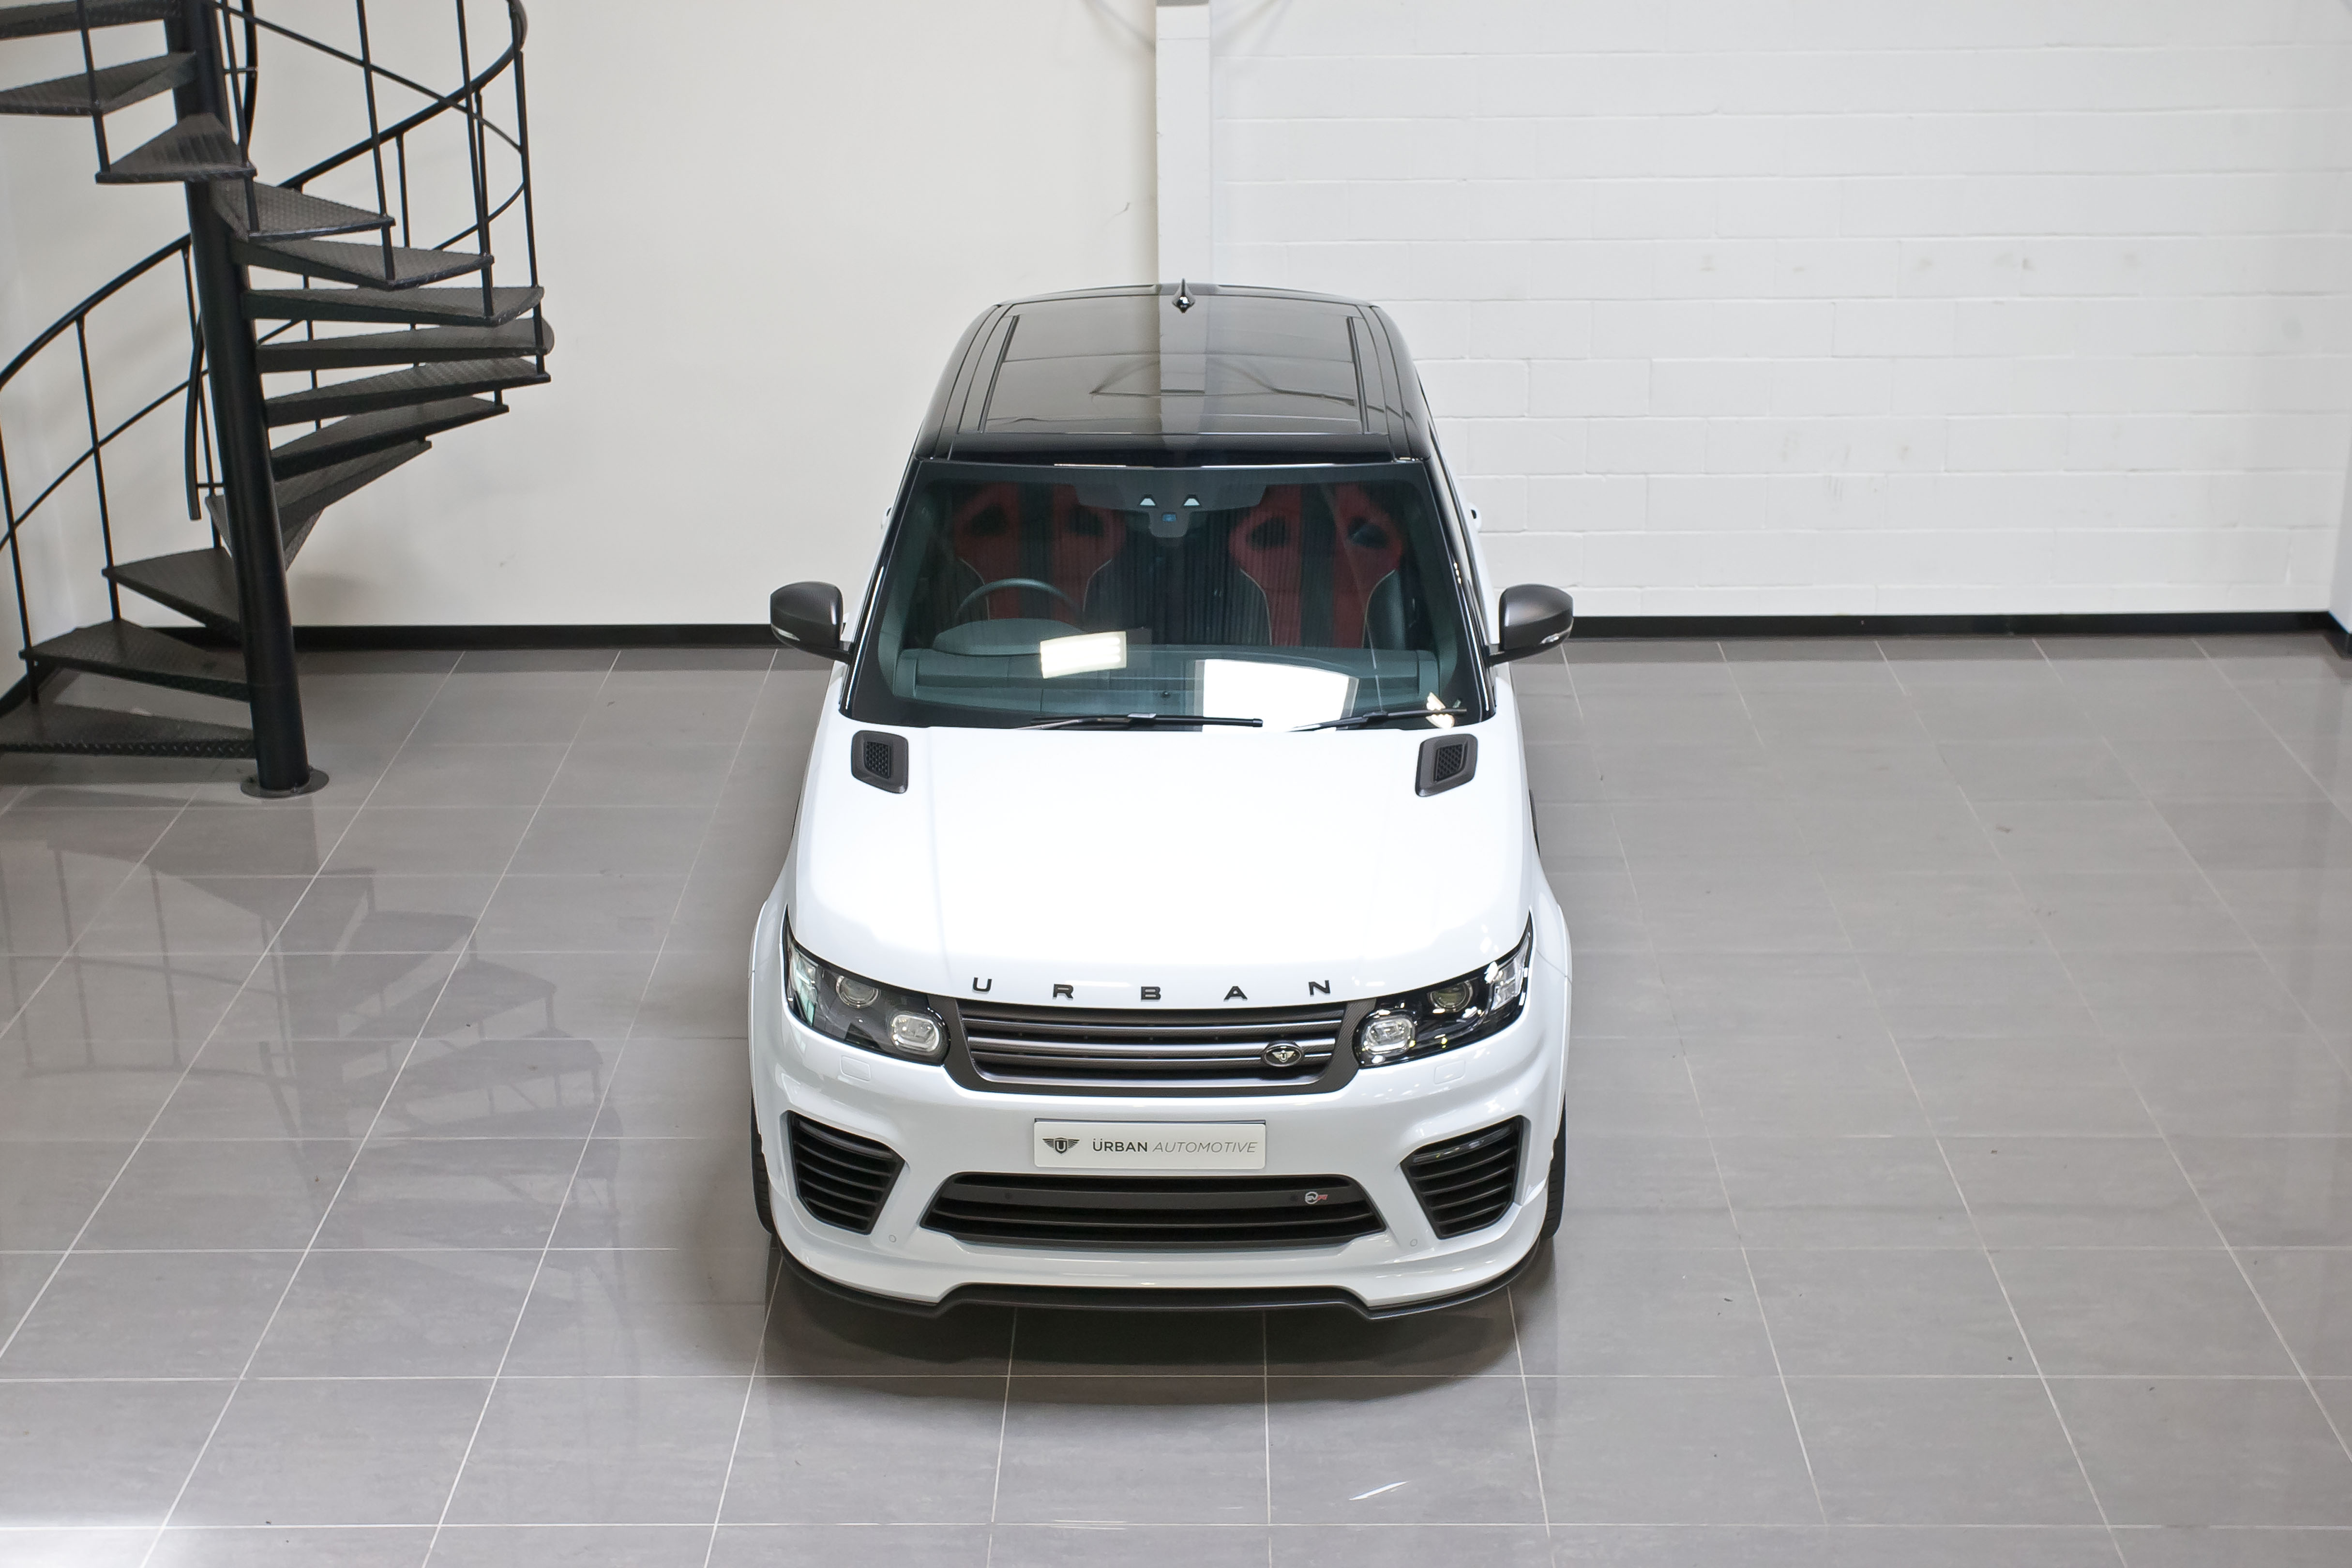 Range Rover SVR Yulong Matte Carbon45